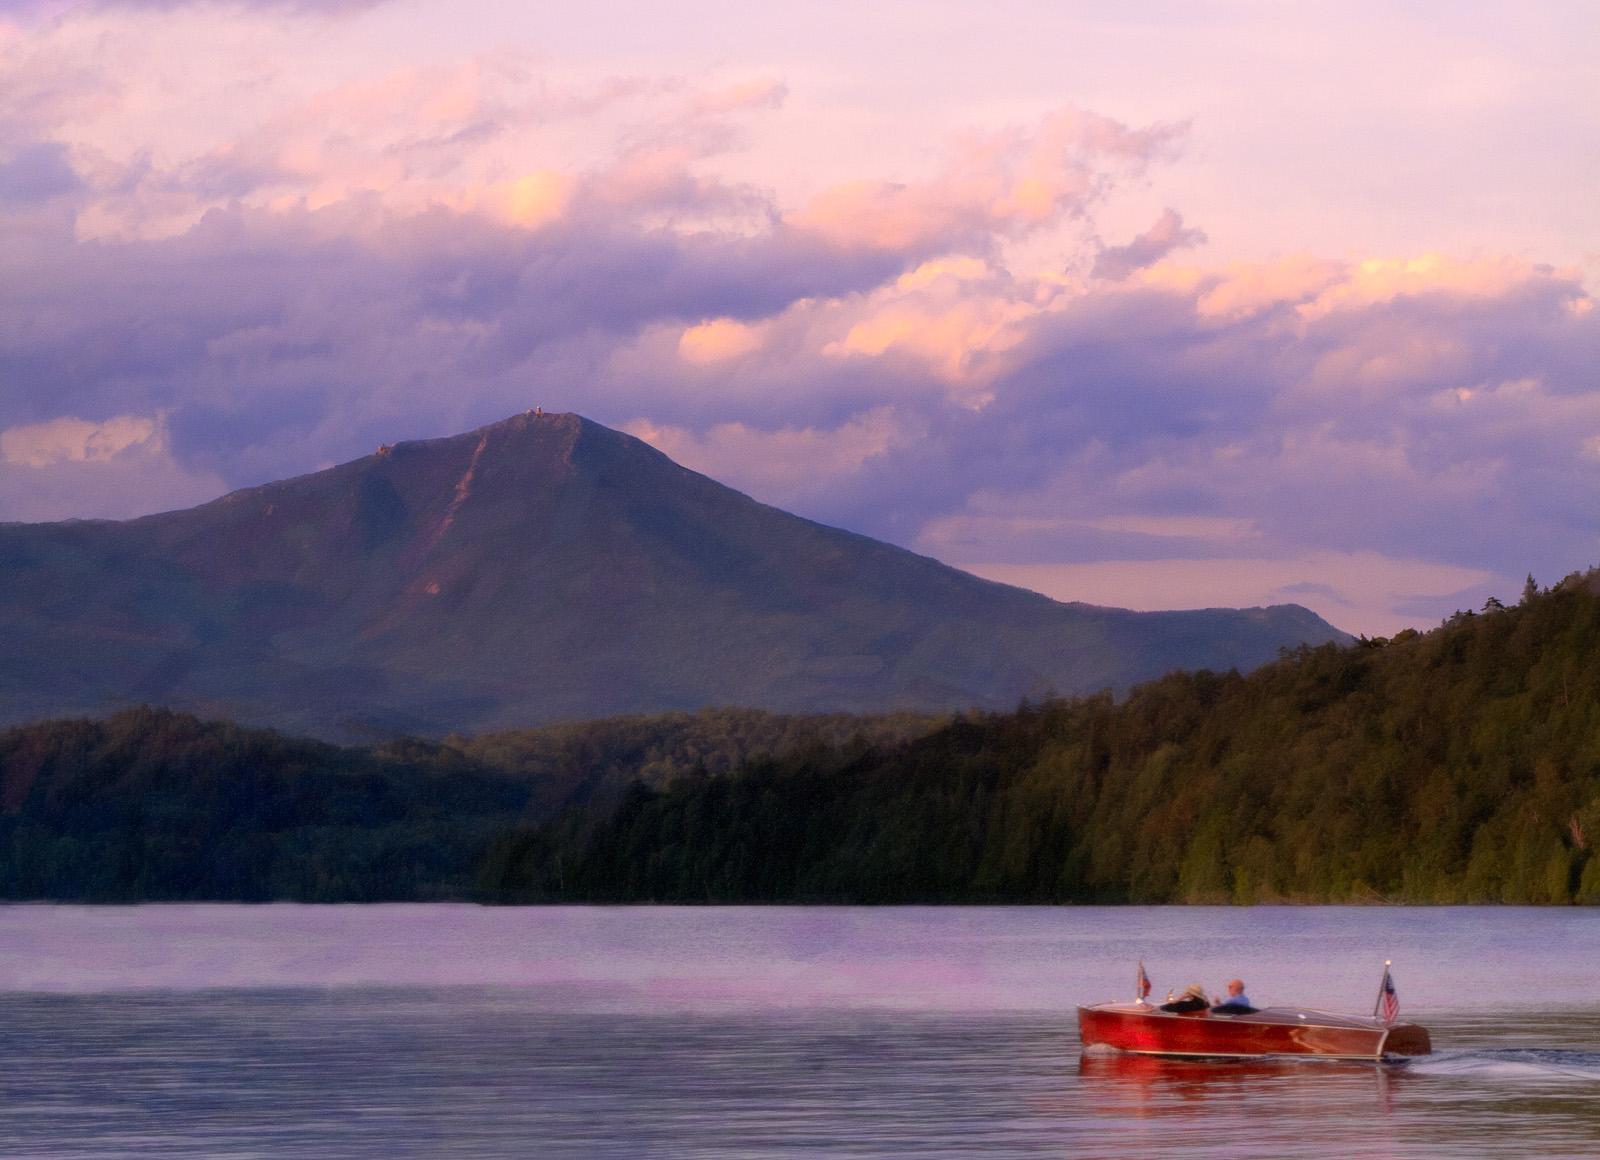 Lake Placid Herb Fixler Images 1600x1160